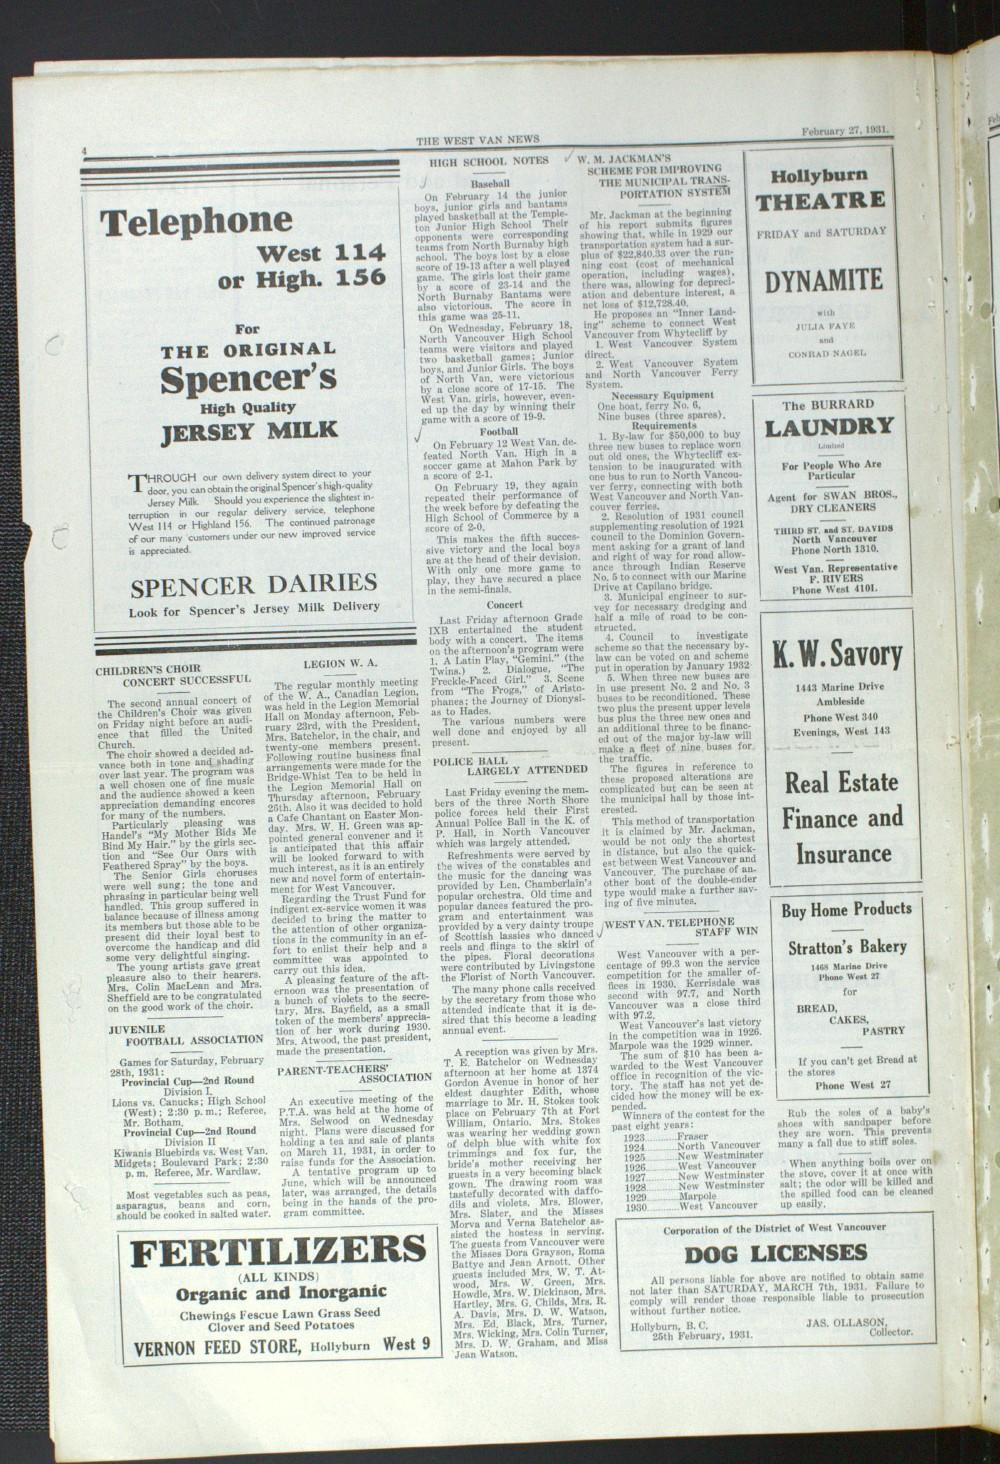 West Van. News (West Vancouver), 27 Feb 1931